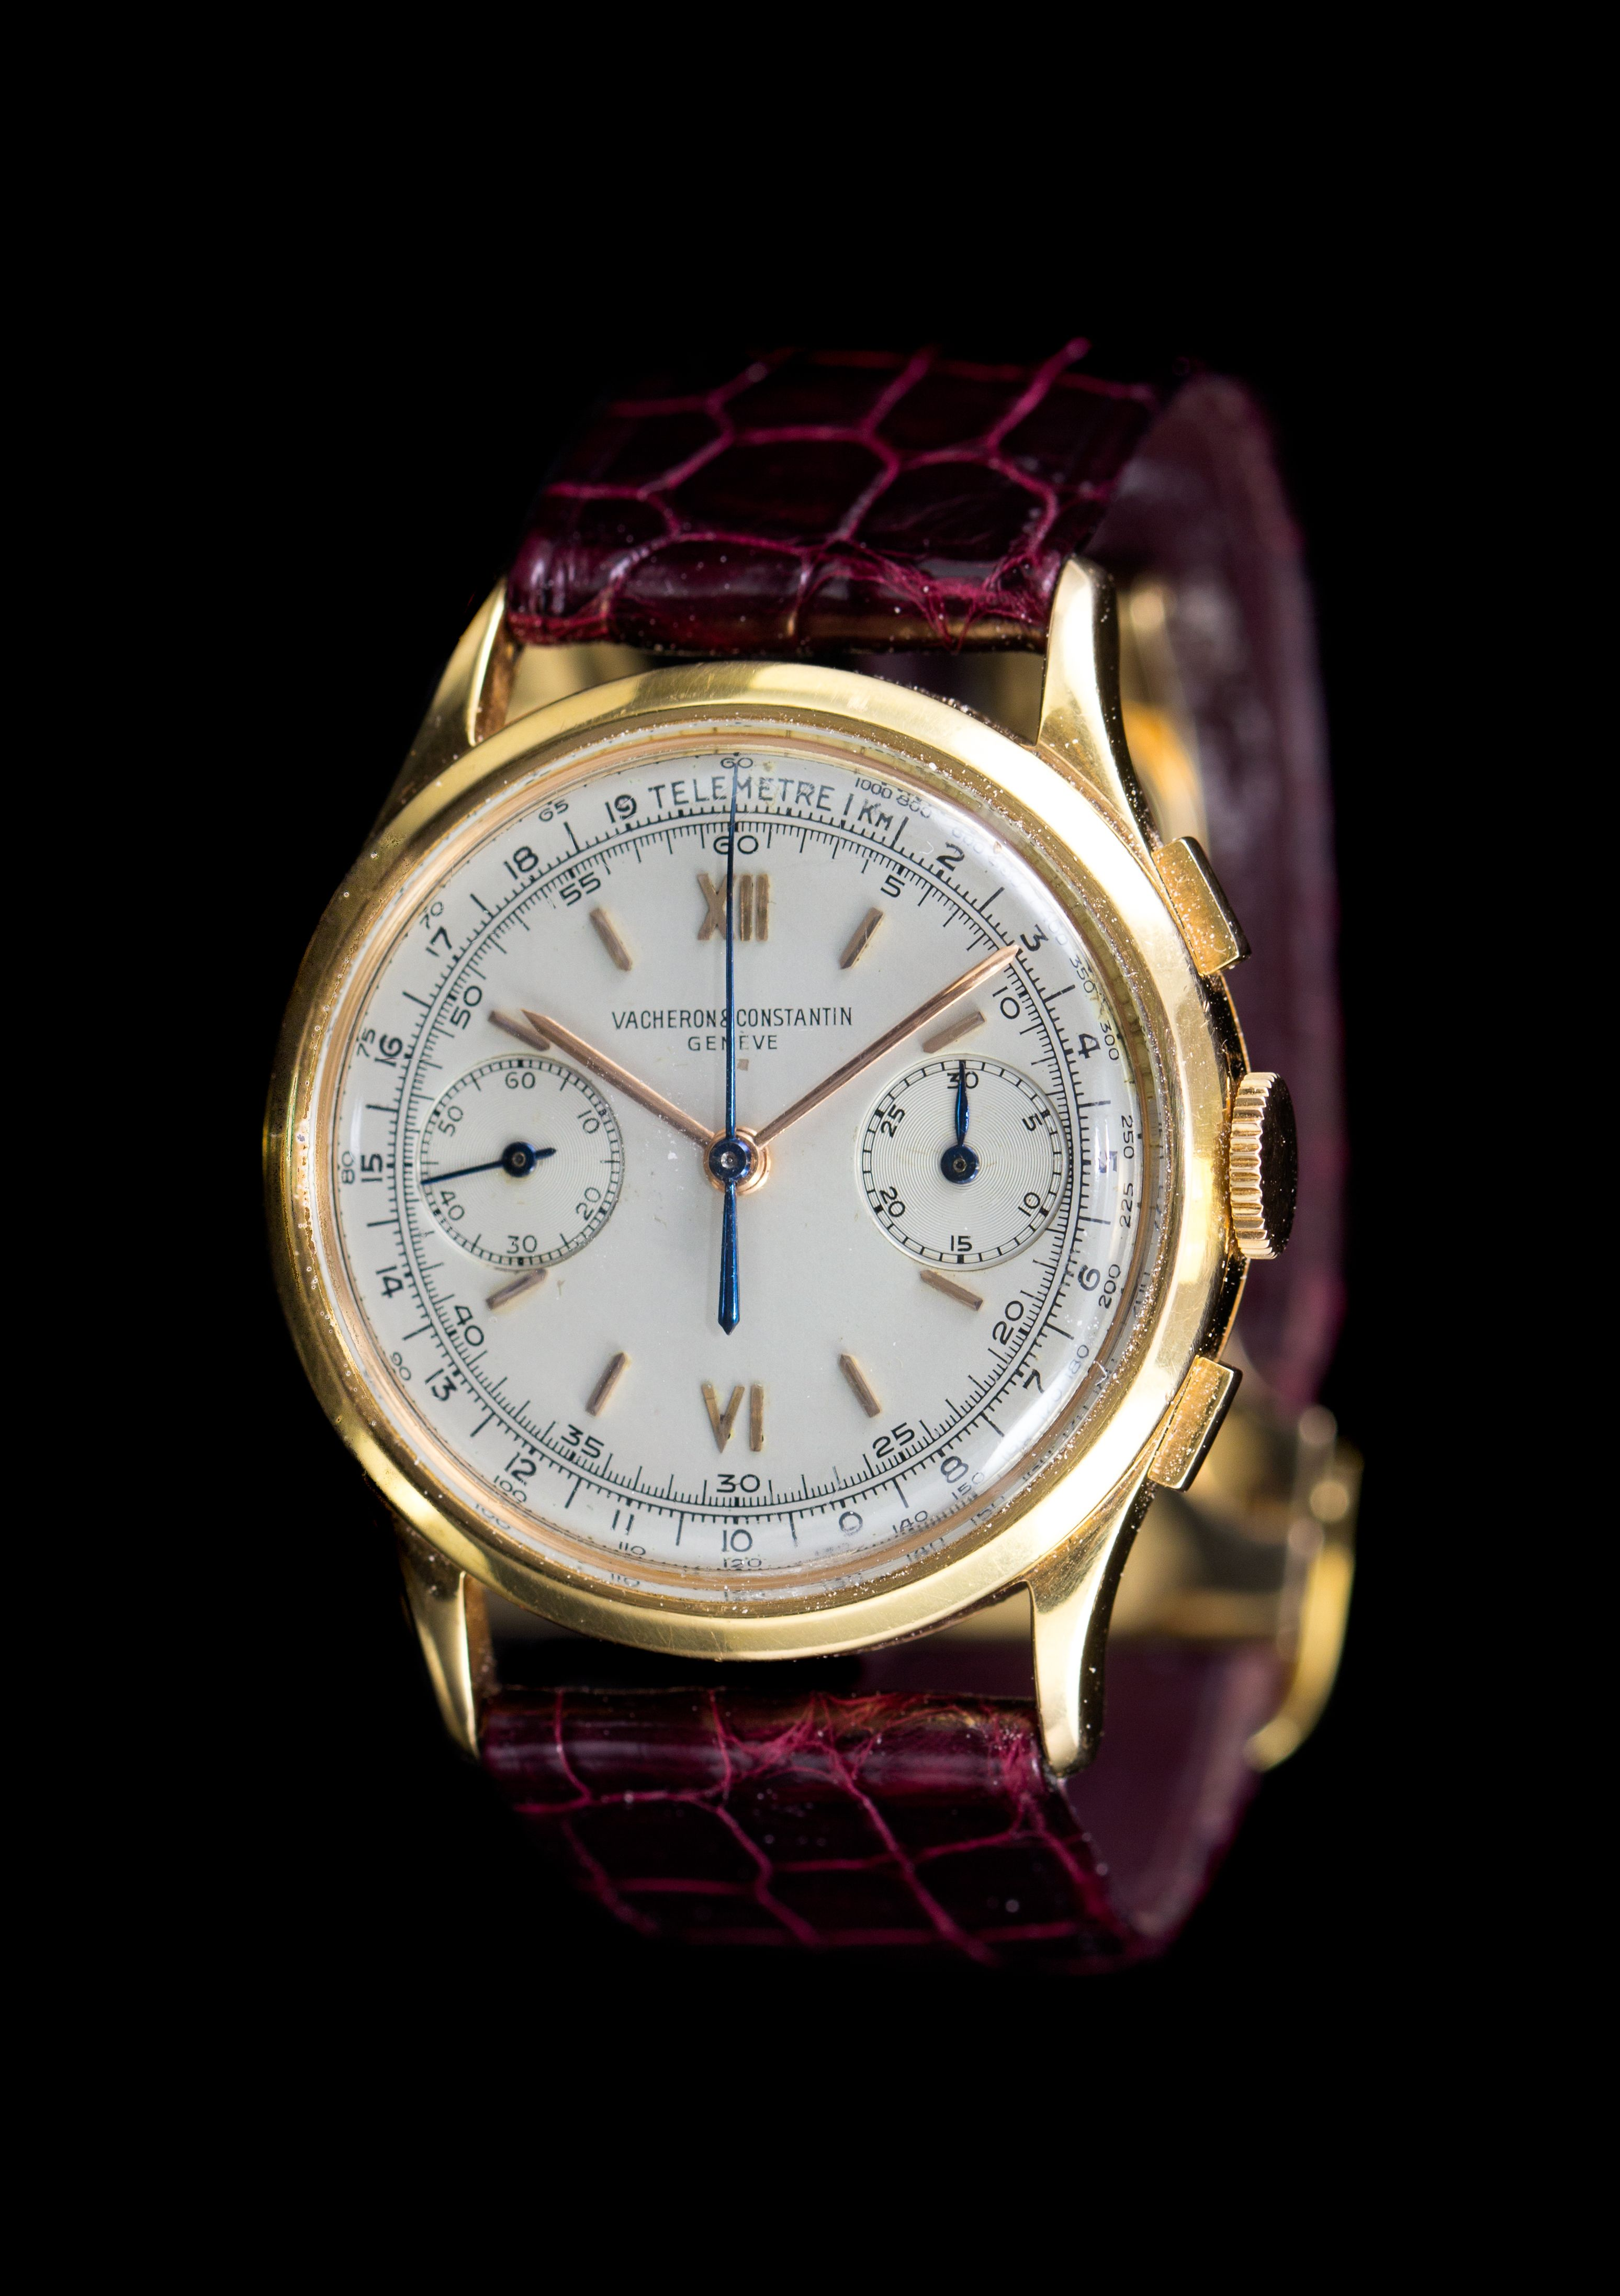 An 18 Karat Pink Gold Chronograph Wristwatch, Vacheron